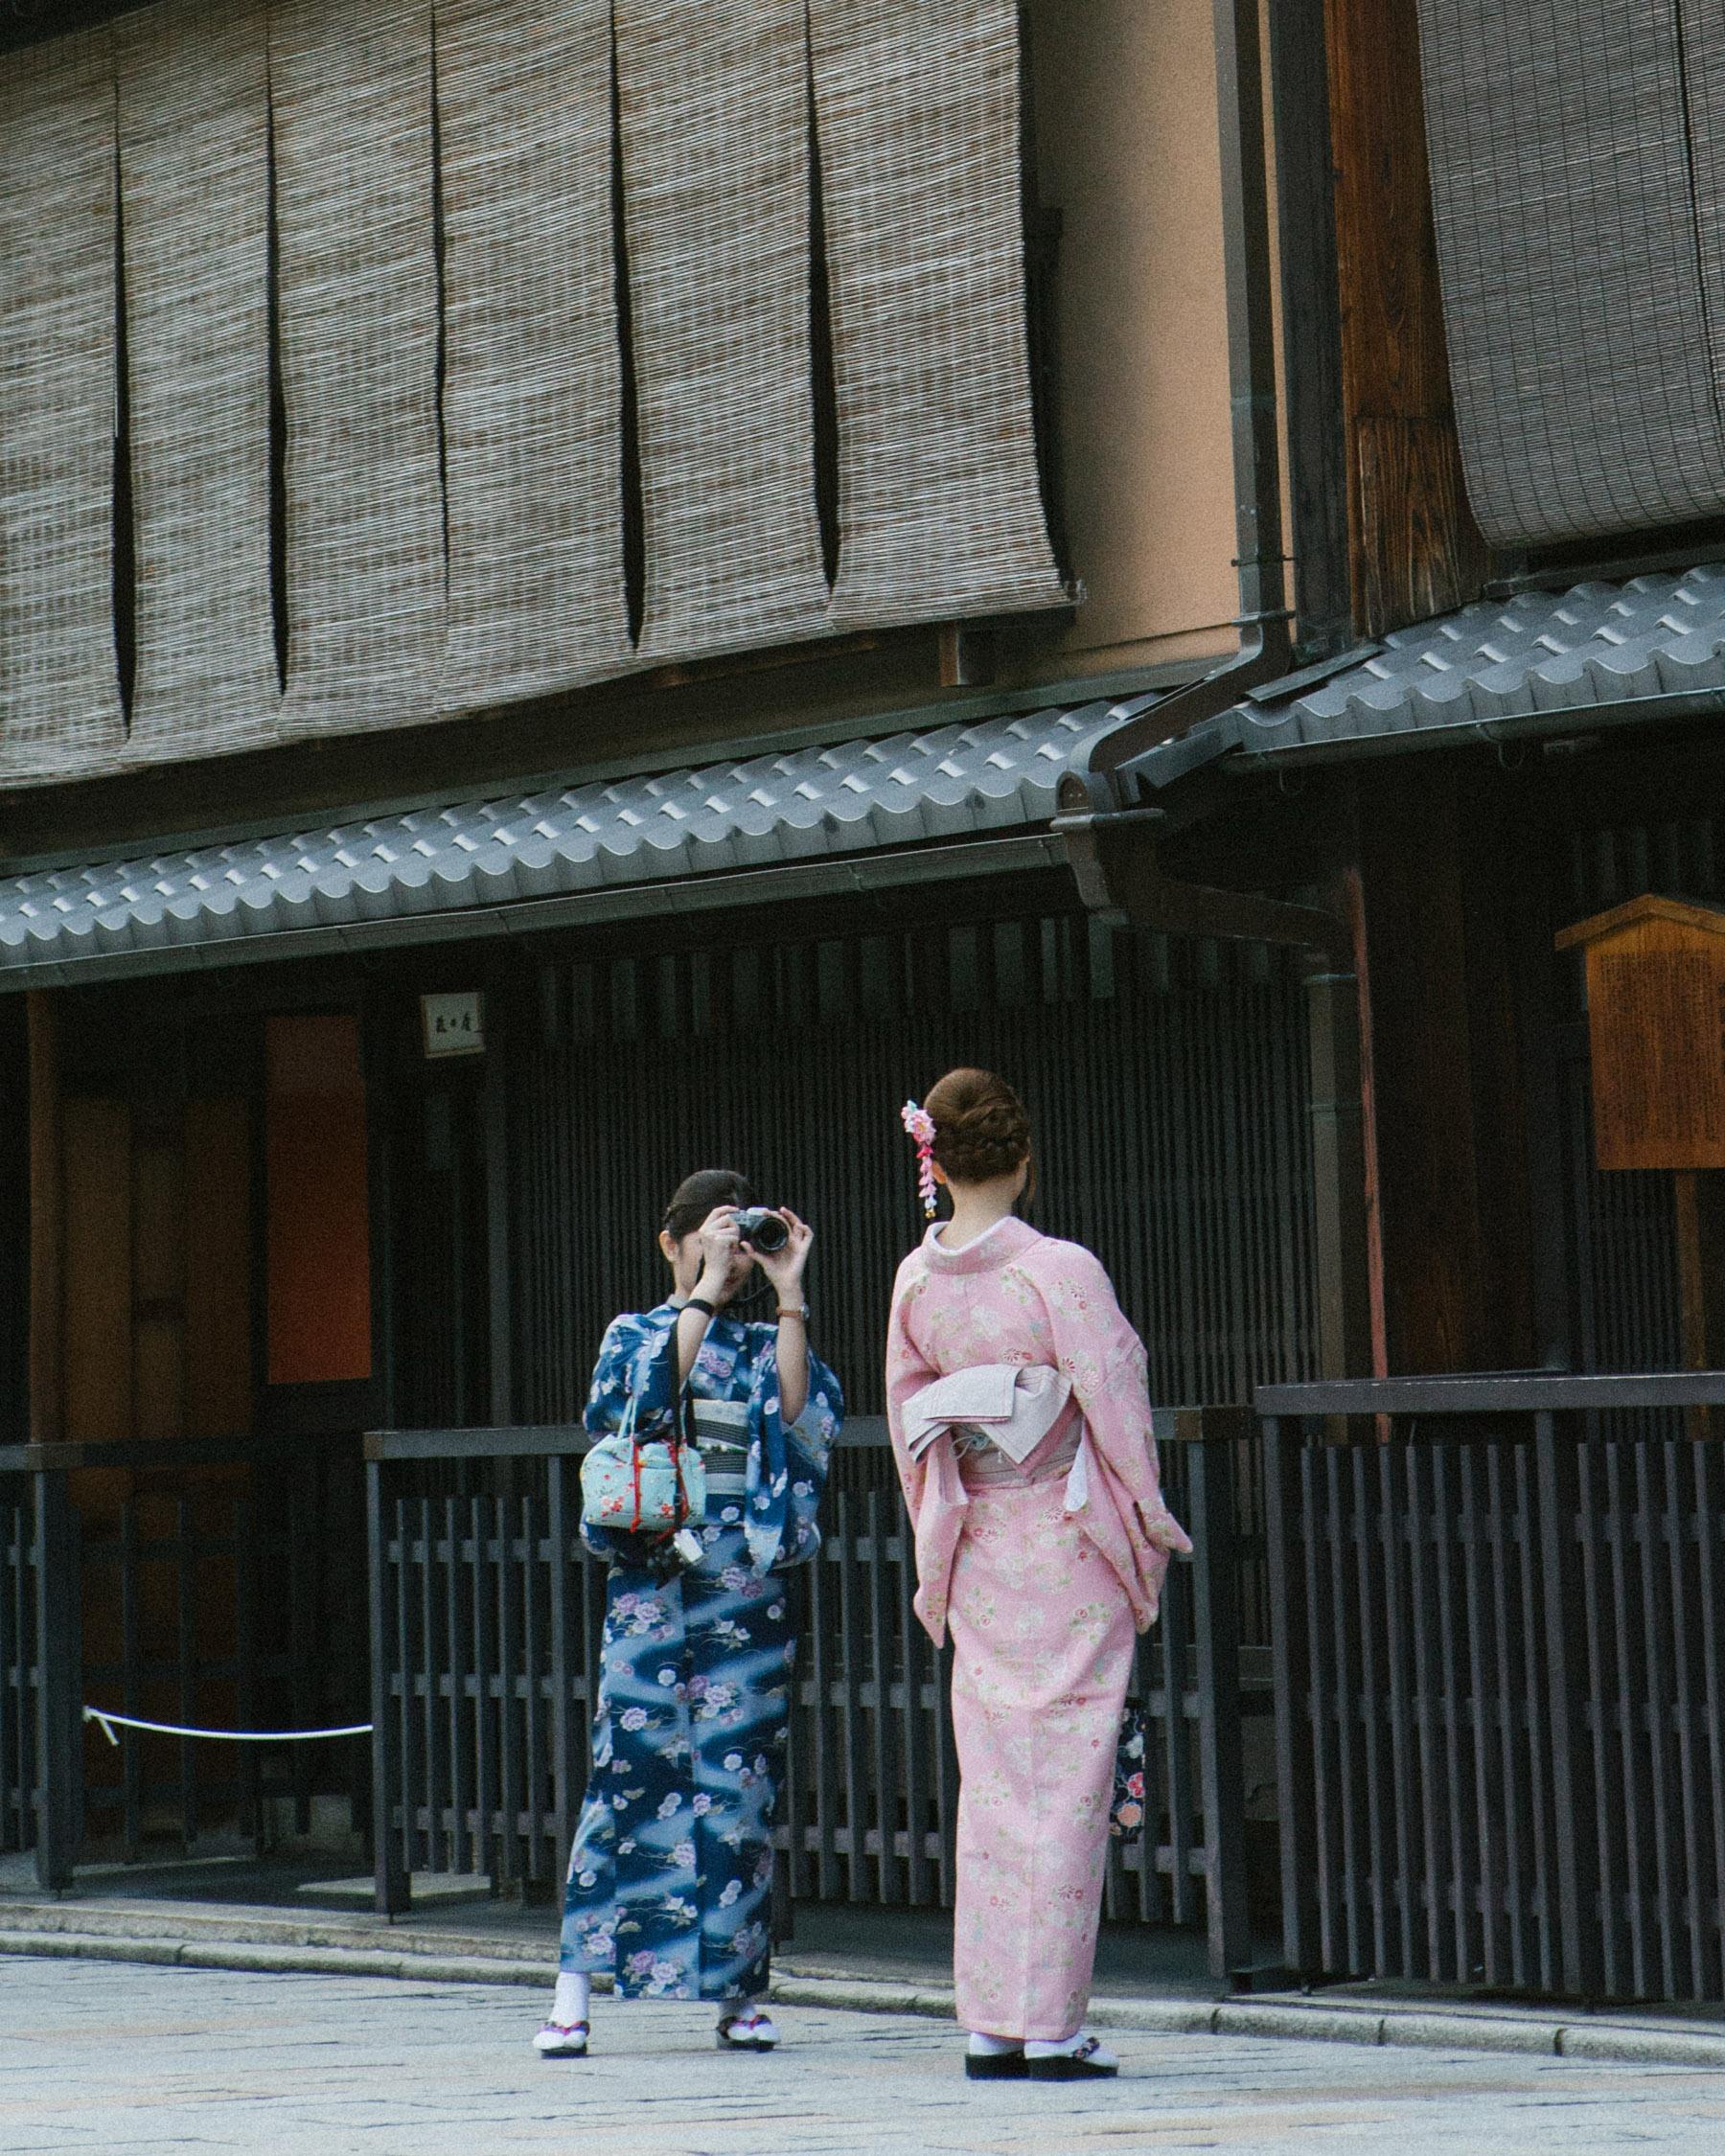 iGNANT-Photography-Will-Matsuda-Kyoto-019